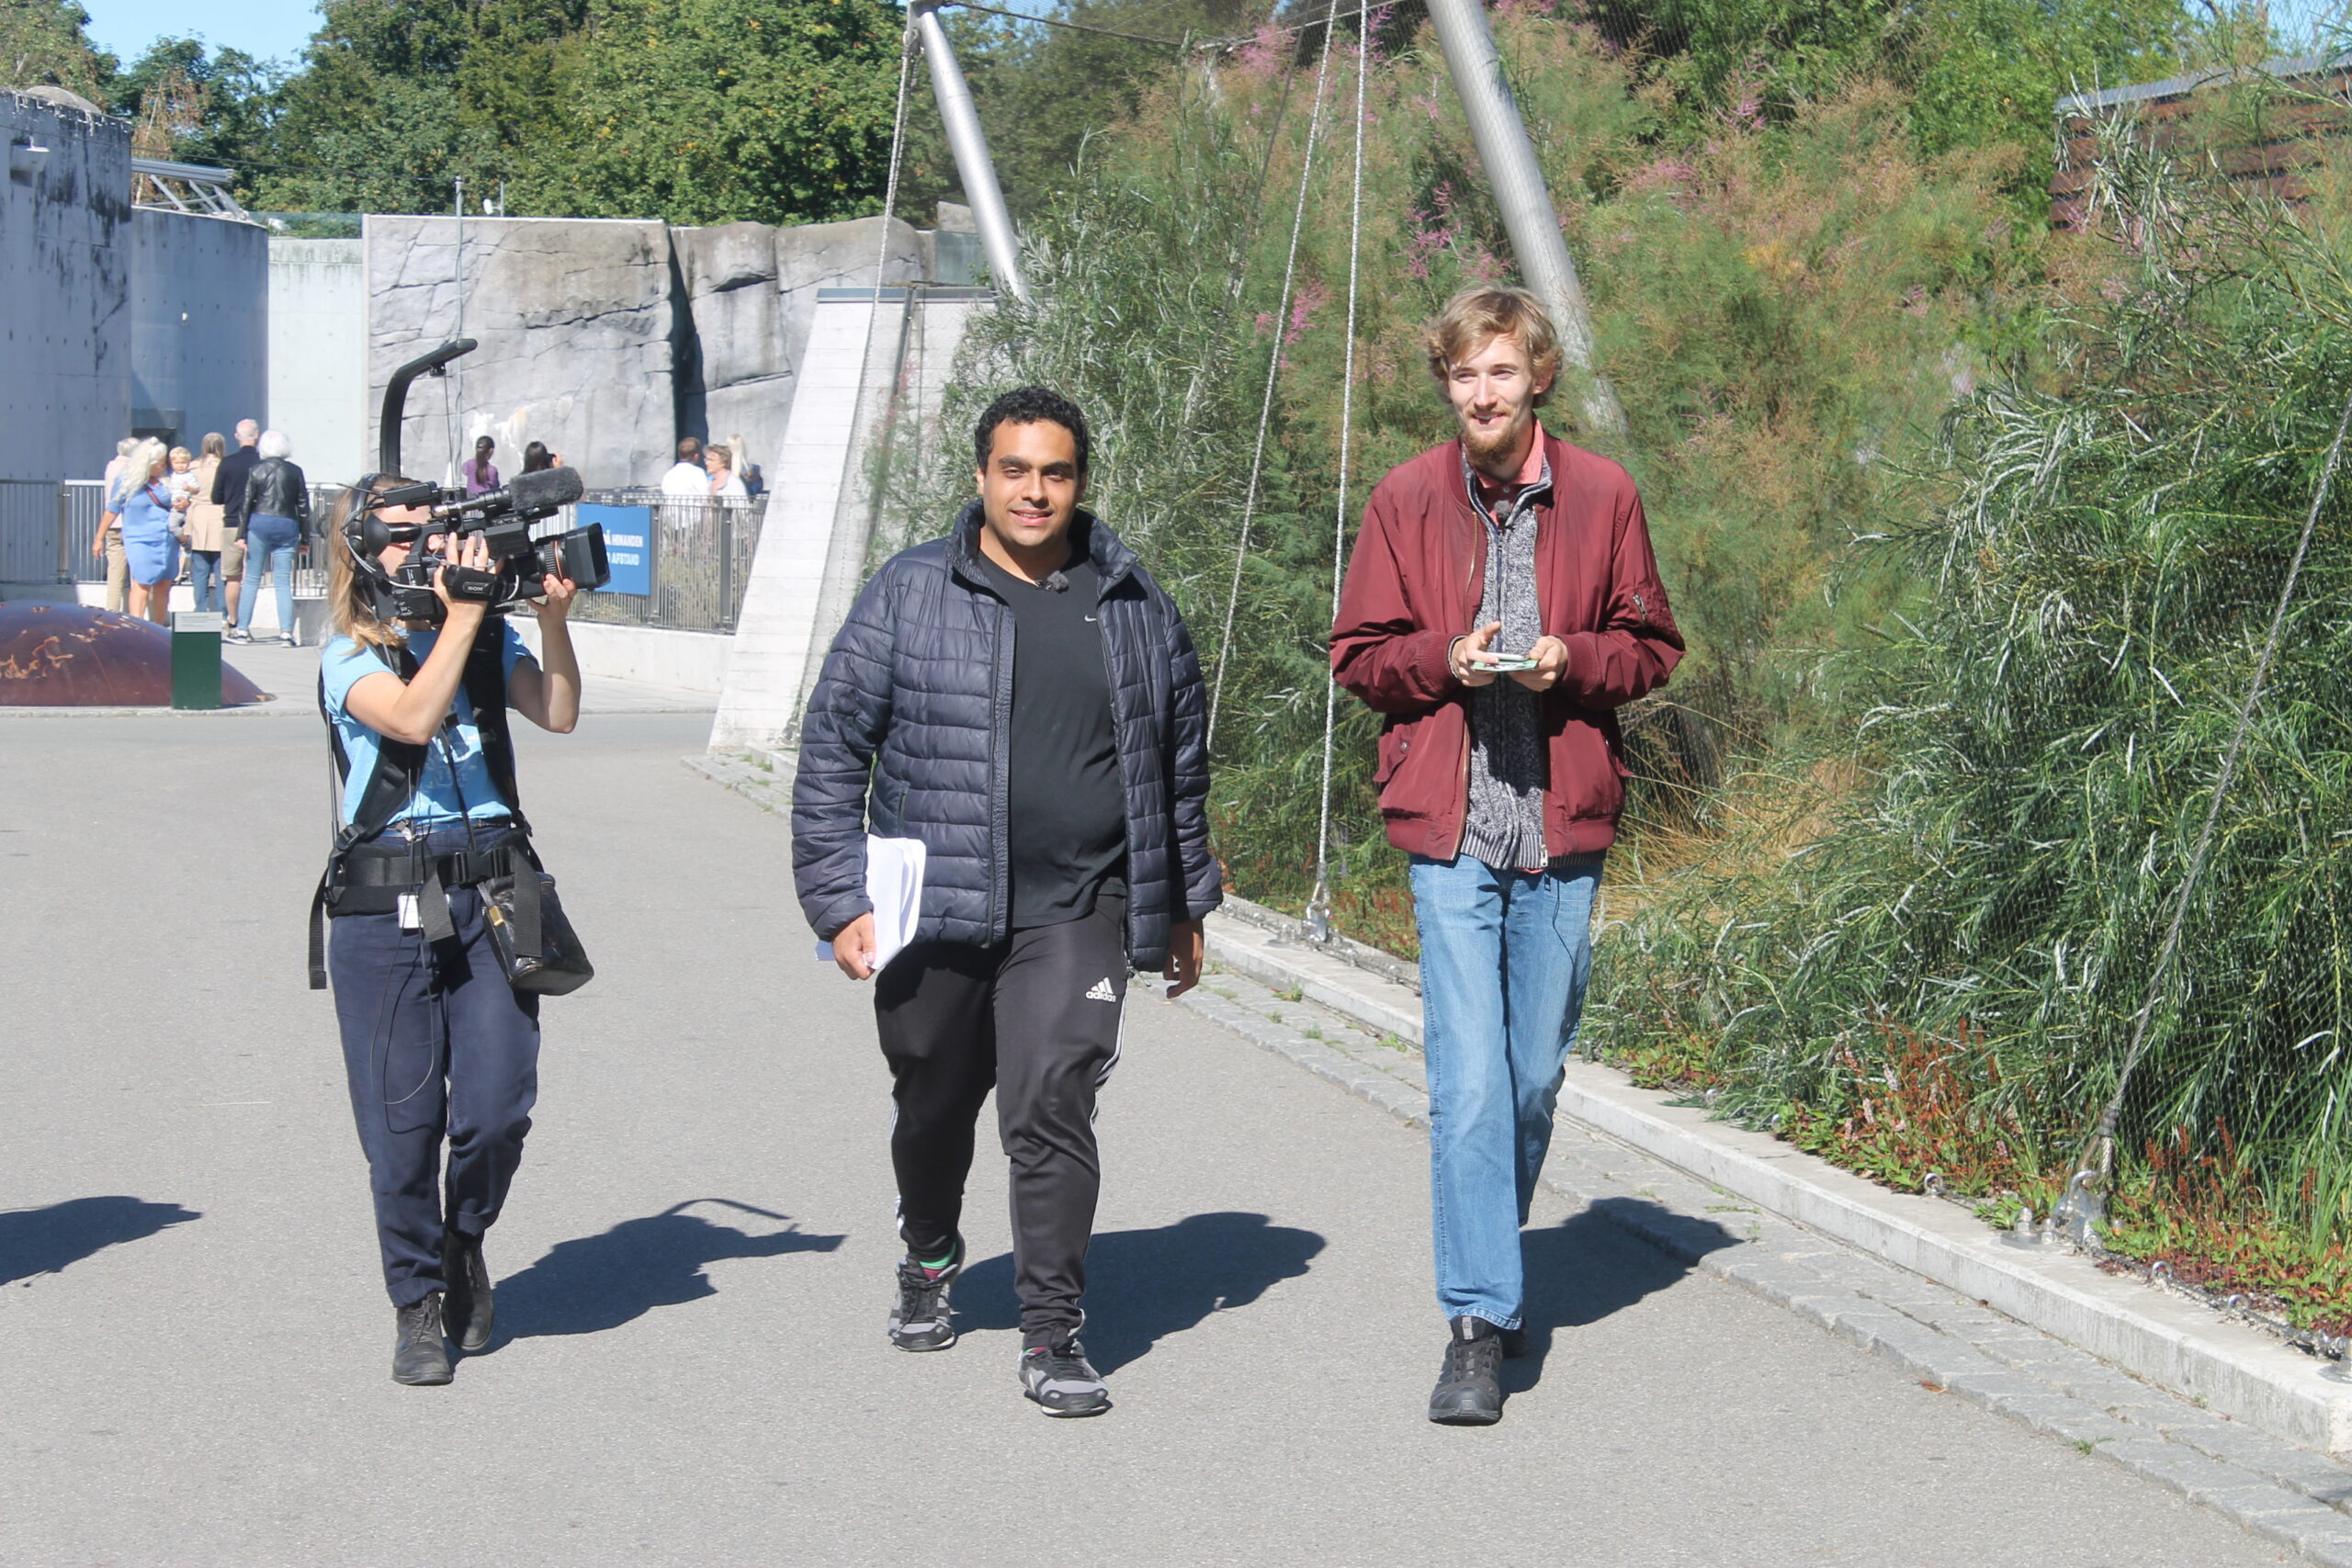 Mohamed Eldigwy og Mark Lorentsen på tv-optagelser i Zoologisk Have